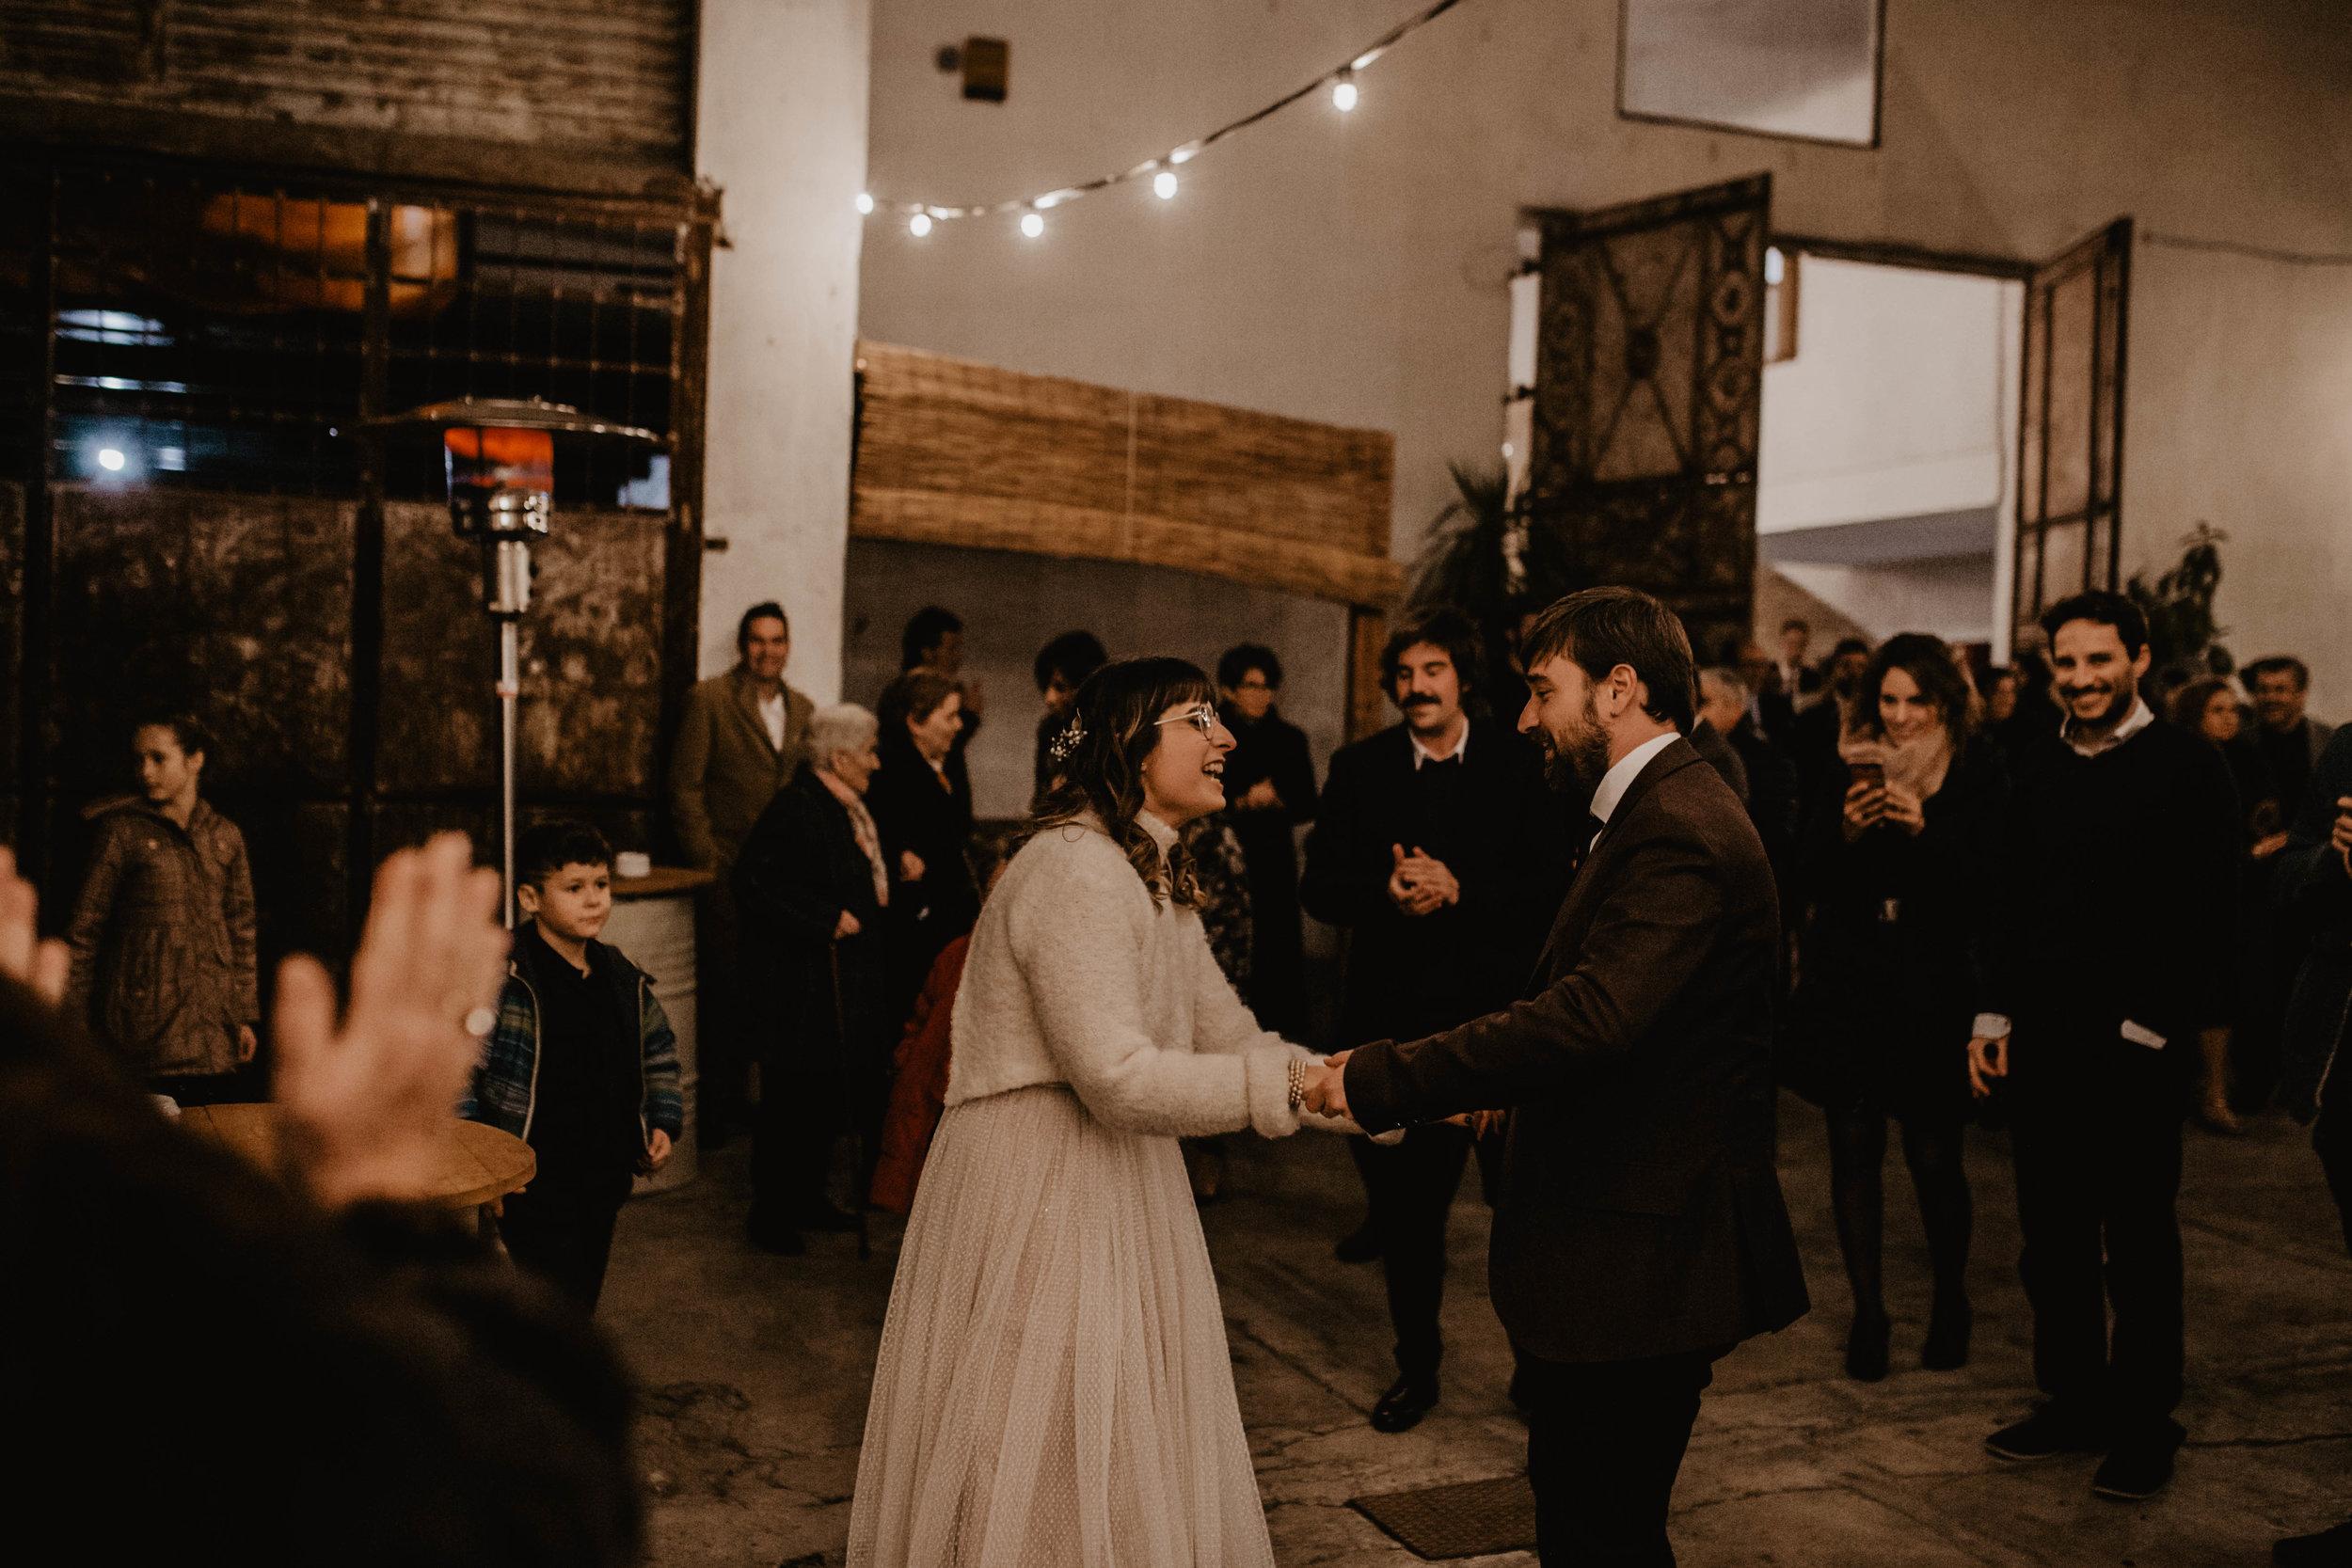 thenortherngirlphotography-photography-weddingphotography-couple-bodasconestilo-bodasenbarcelona-martadavid-1101.jpg